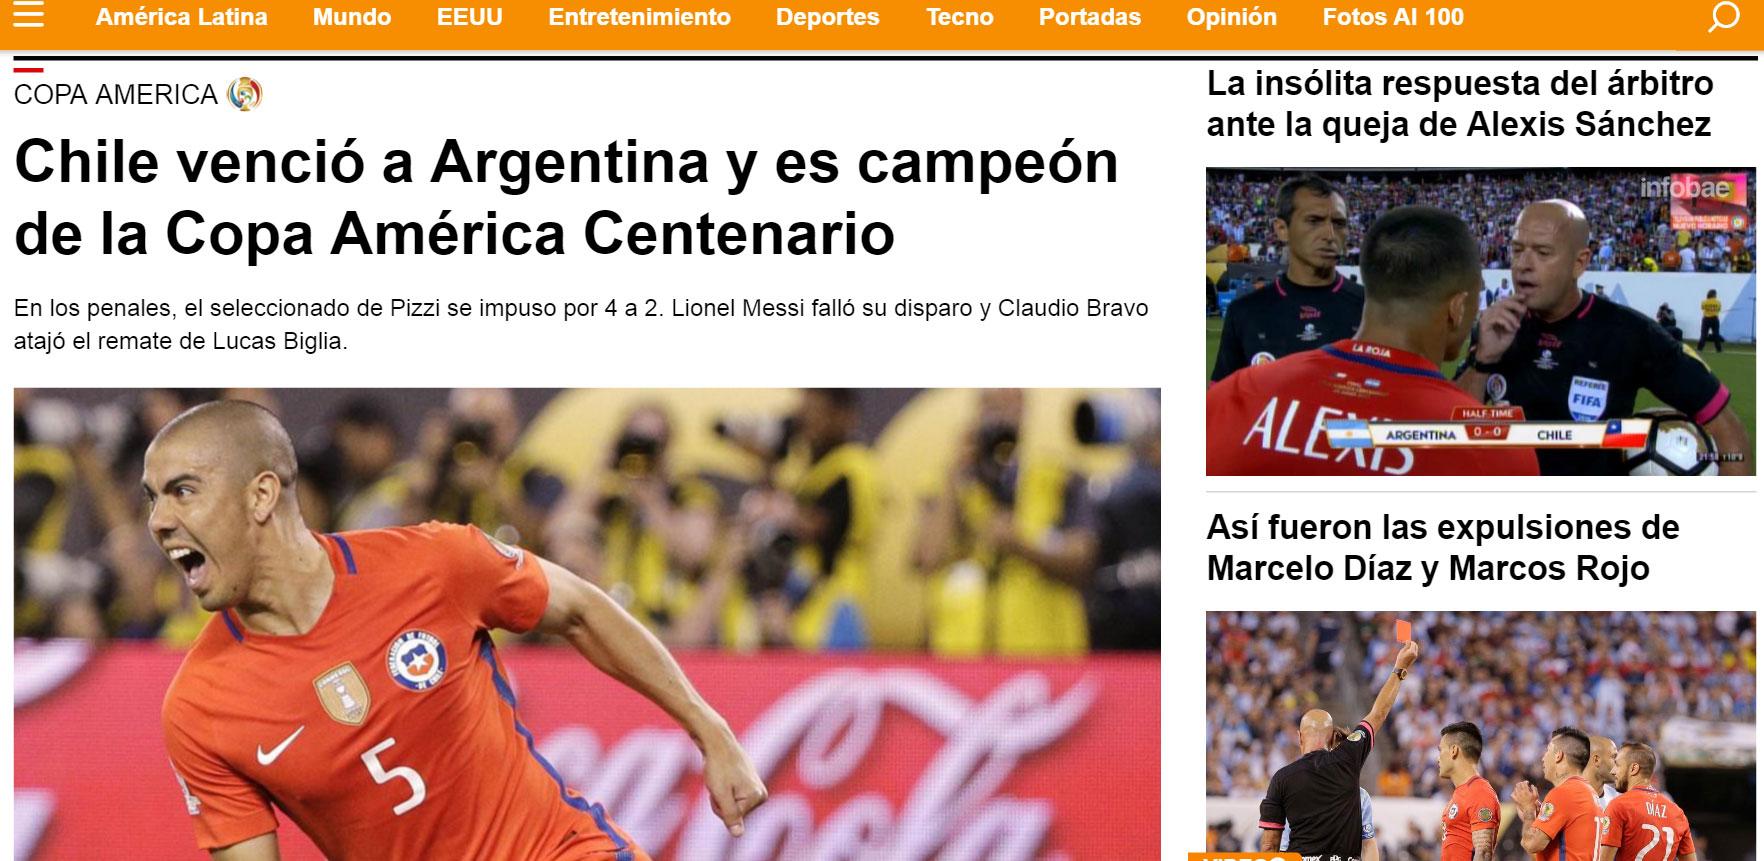 prensa argentina lapidaria con su selecci 243 n ante fracaso